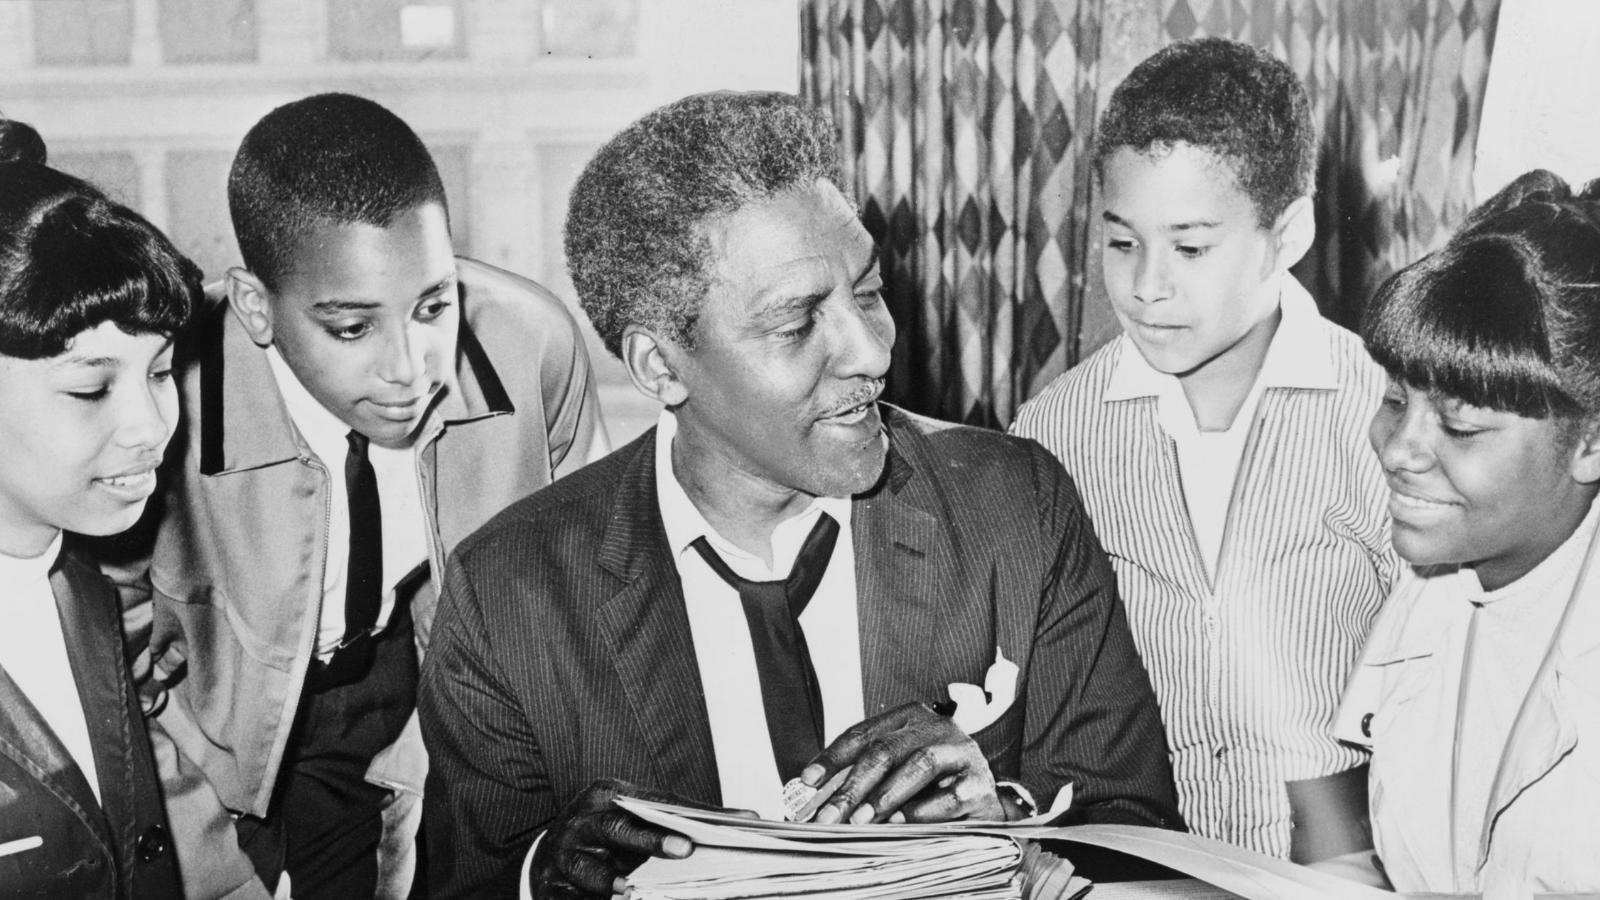 Bayard Rustin with young people